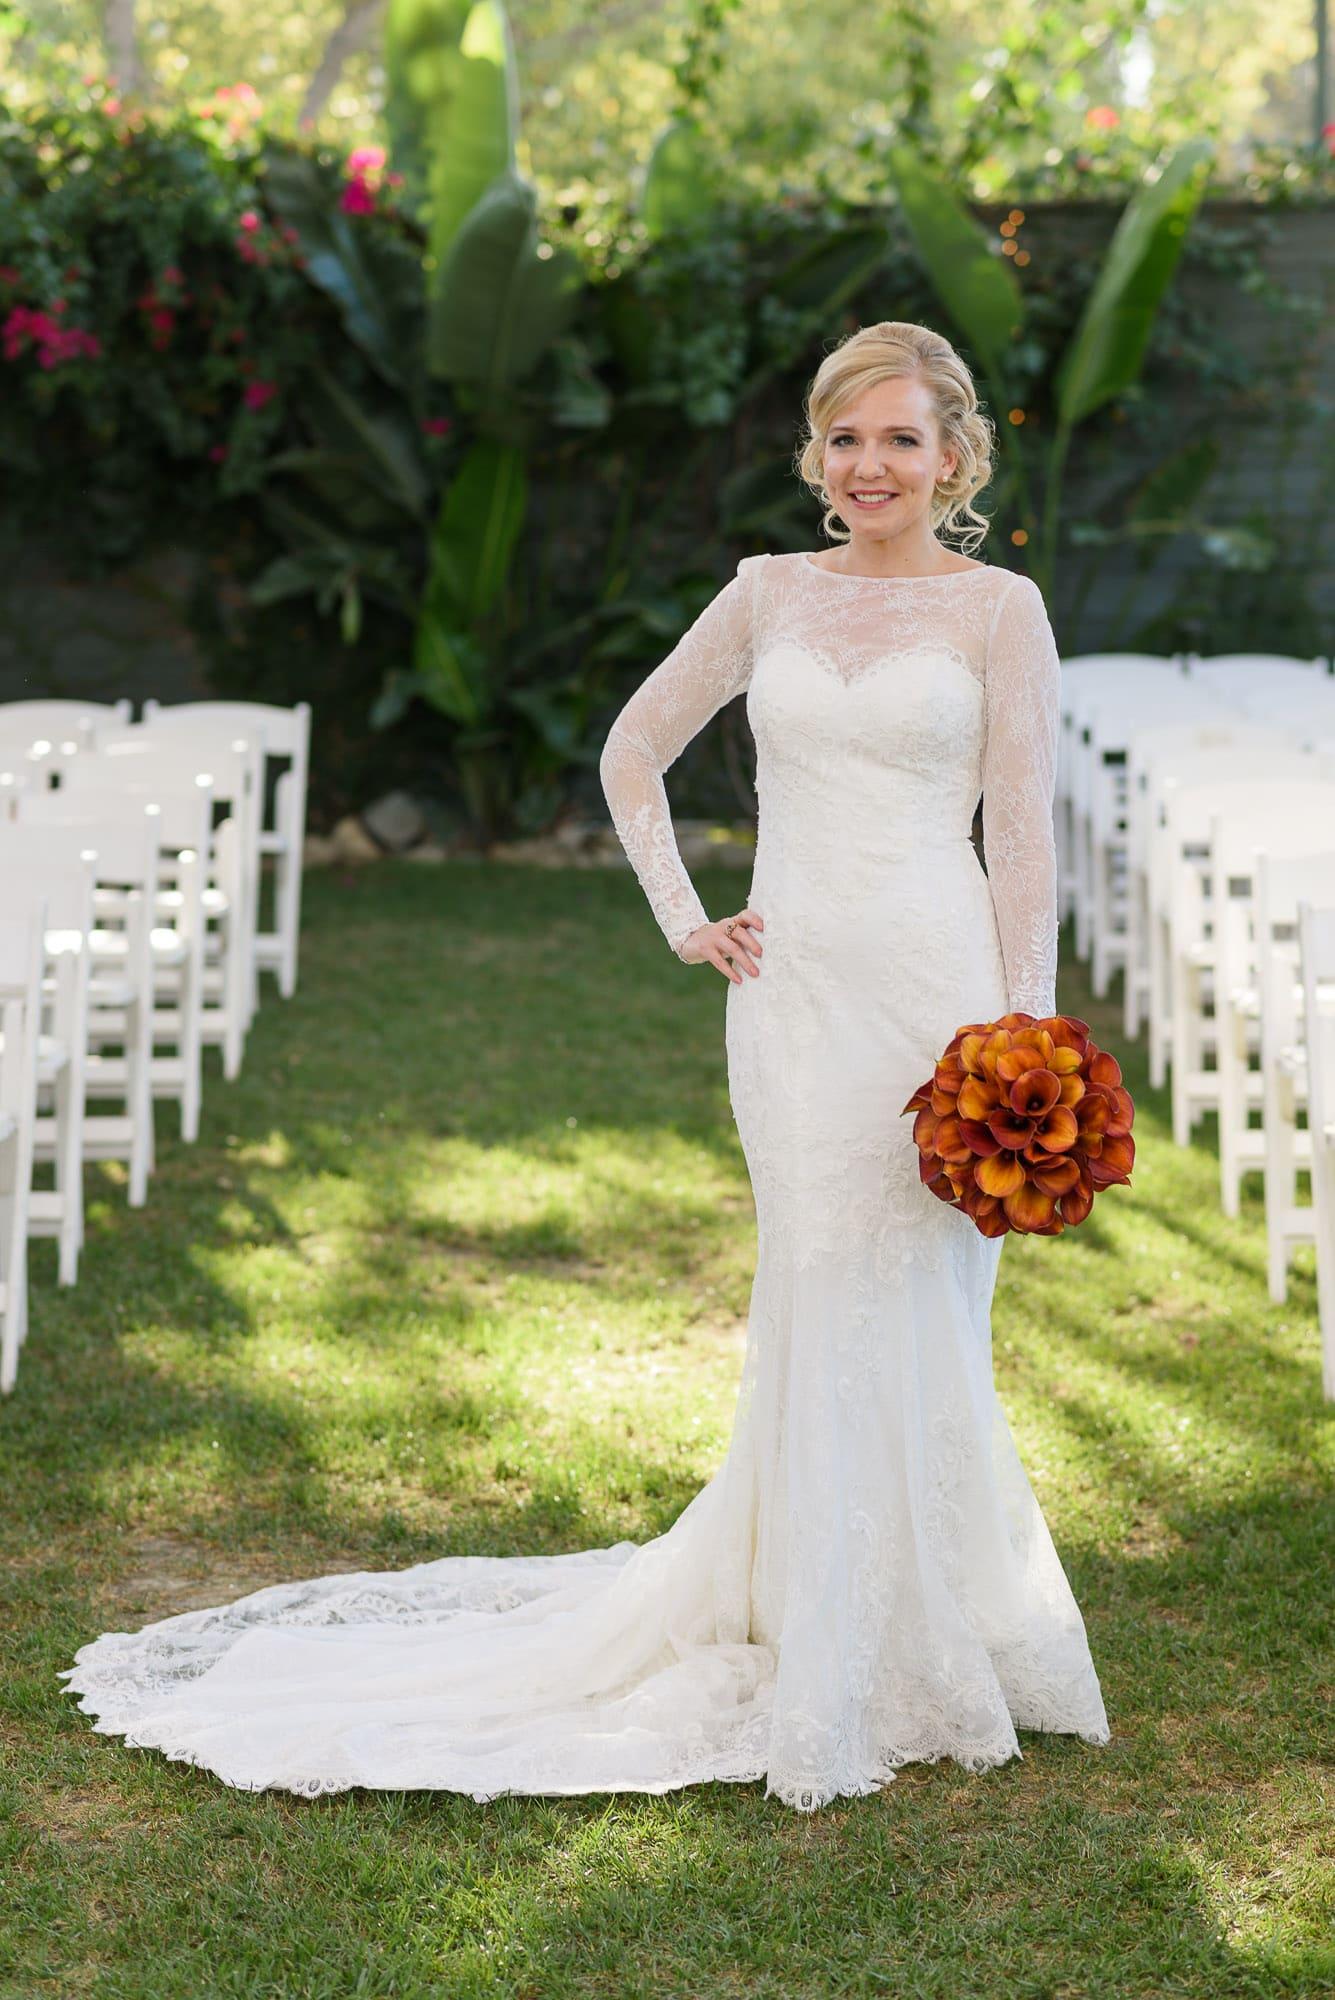 015_Alan_and_Heidi_Los_Angeles_Equestrian_Center_Wedding